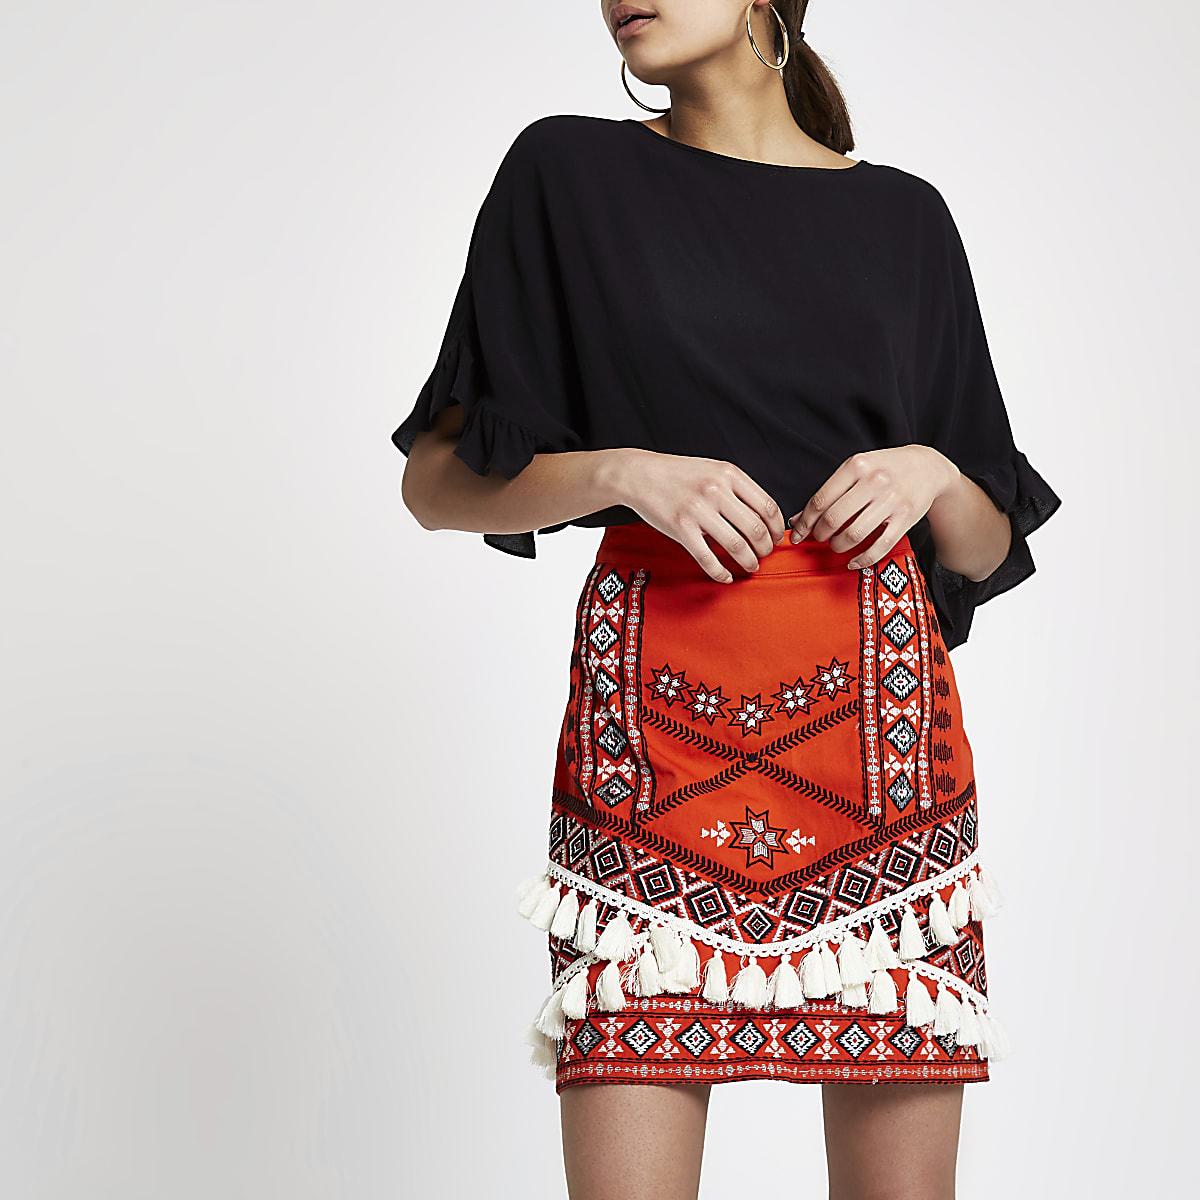 ac2278d5c Red tassel embroidered mini skirt - Mini Skirts - Skirts - women